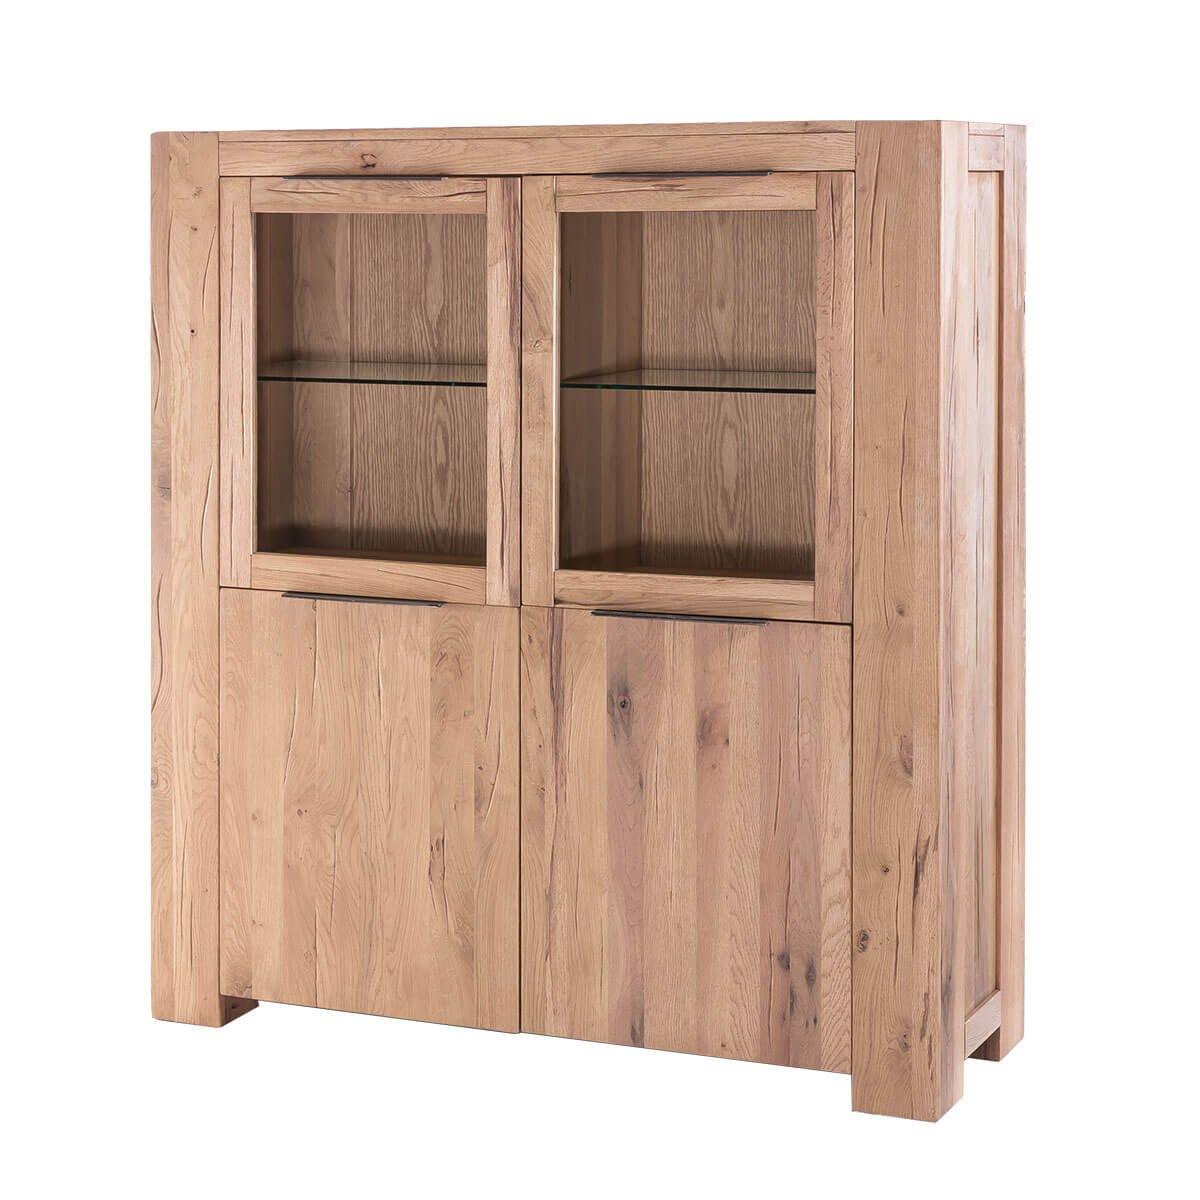 Highboard Anrichte Vitrine Vitrineschrank Granby, Massivholz Holz Eiche massiv Balkeneiche Natural, Breite 140 cm, Tiefe 48 cm, Höhe 160 cm